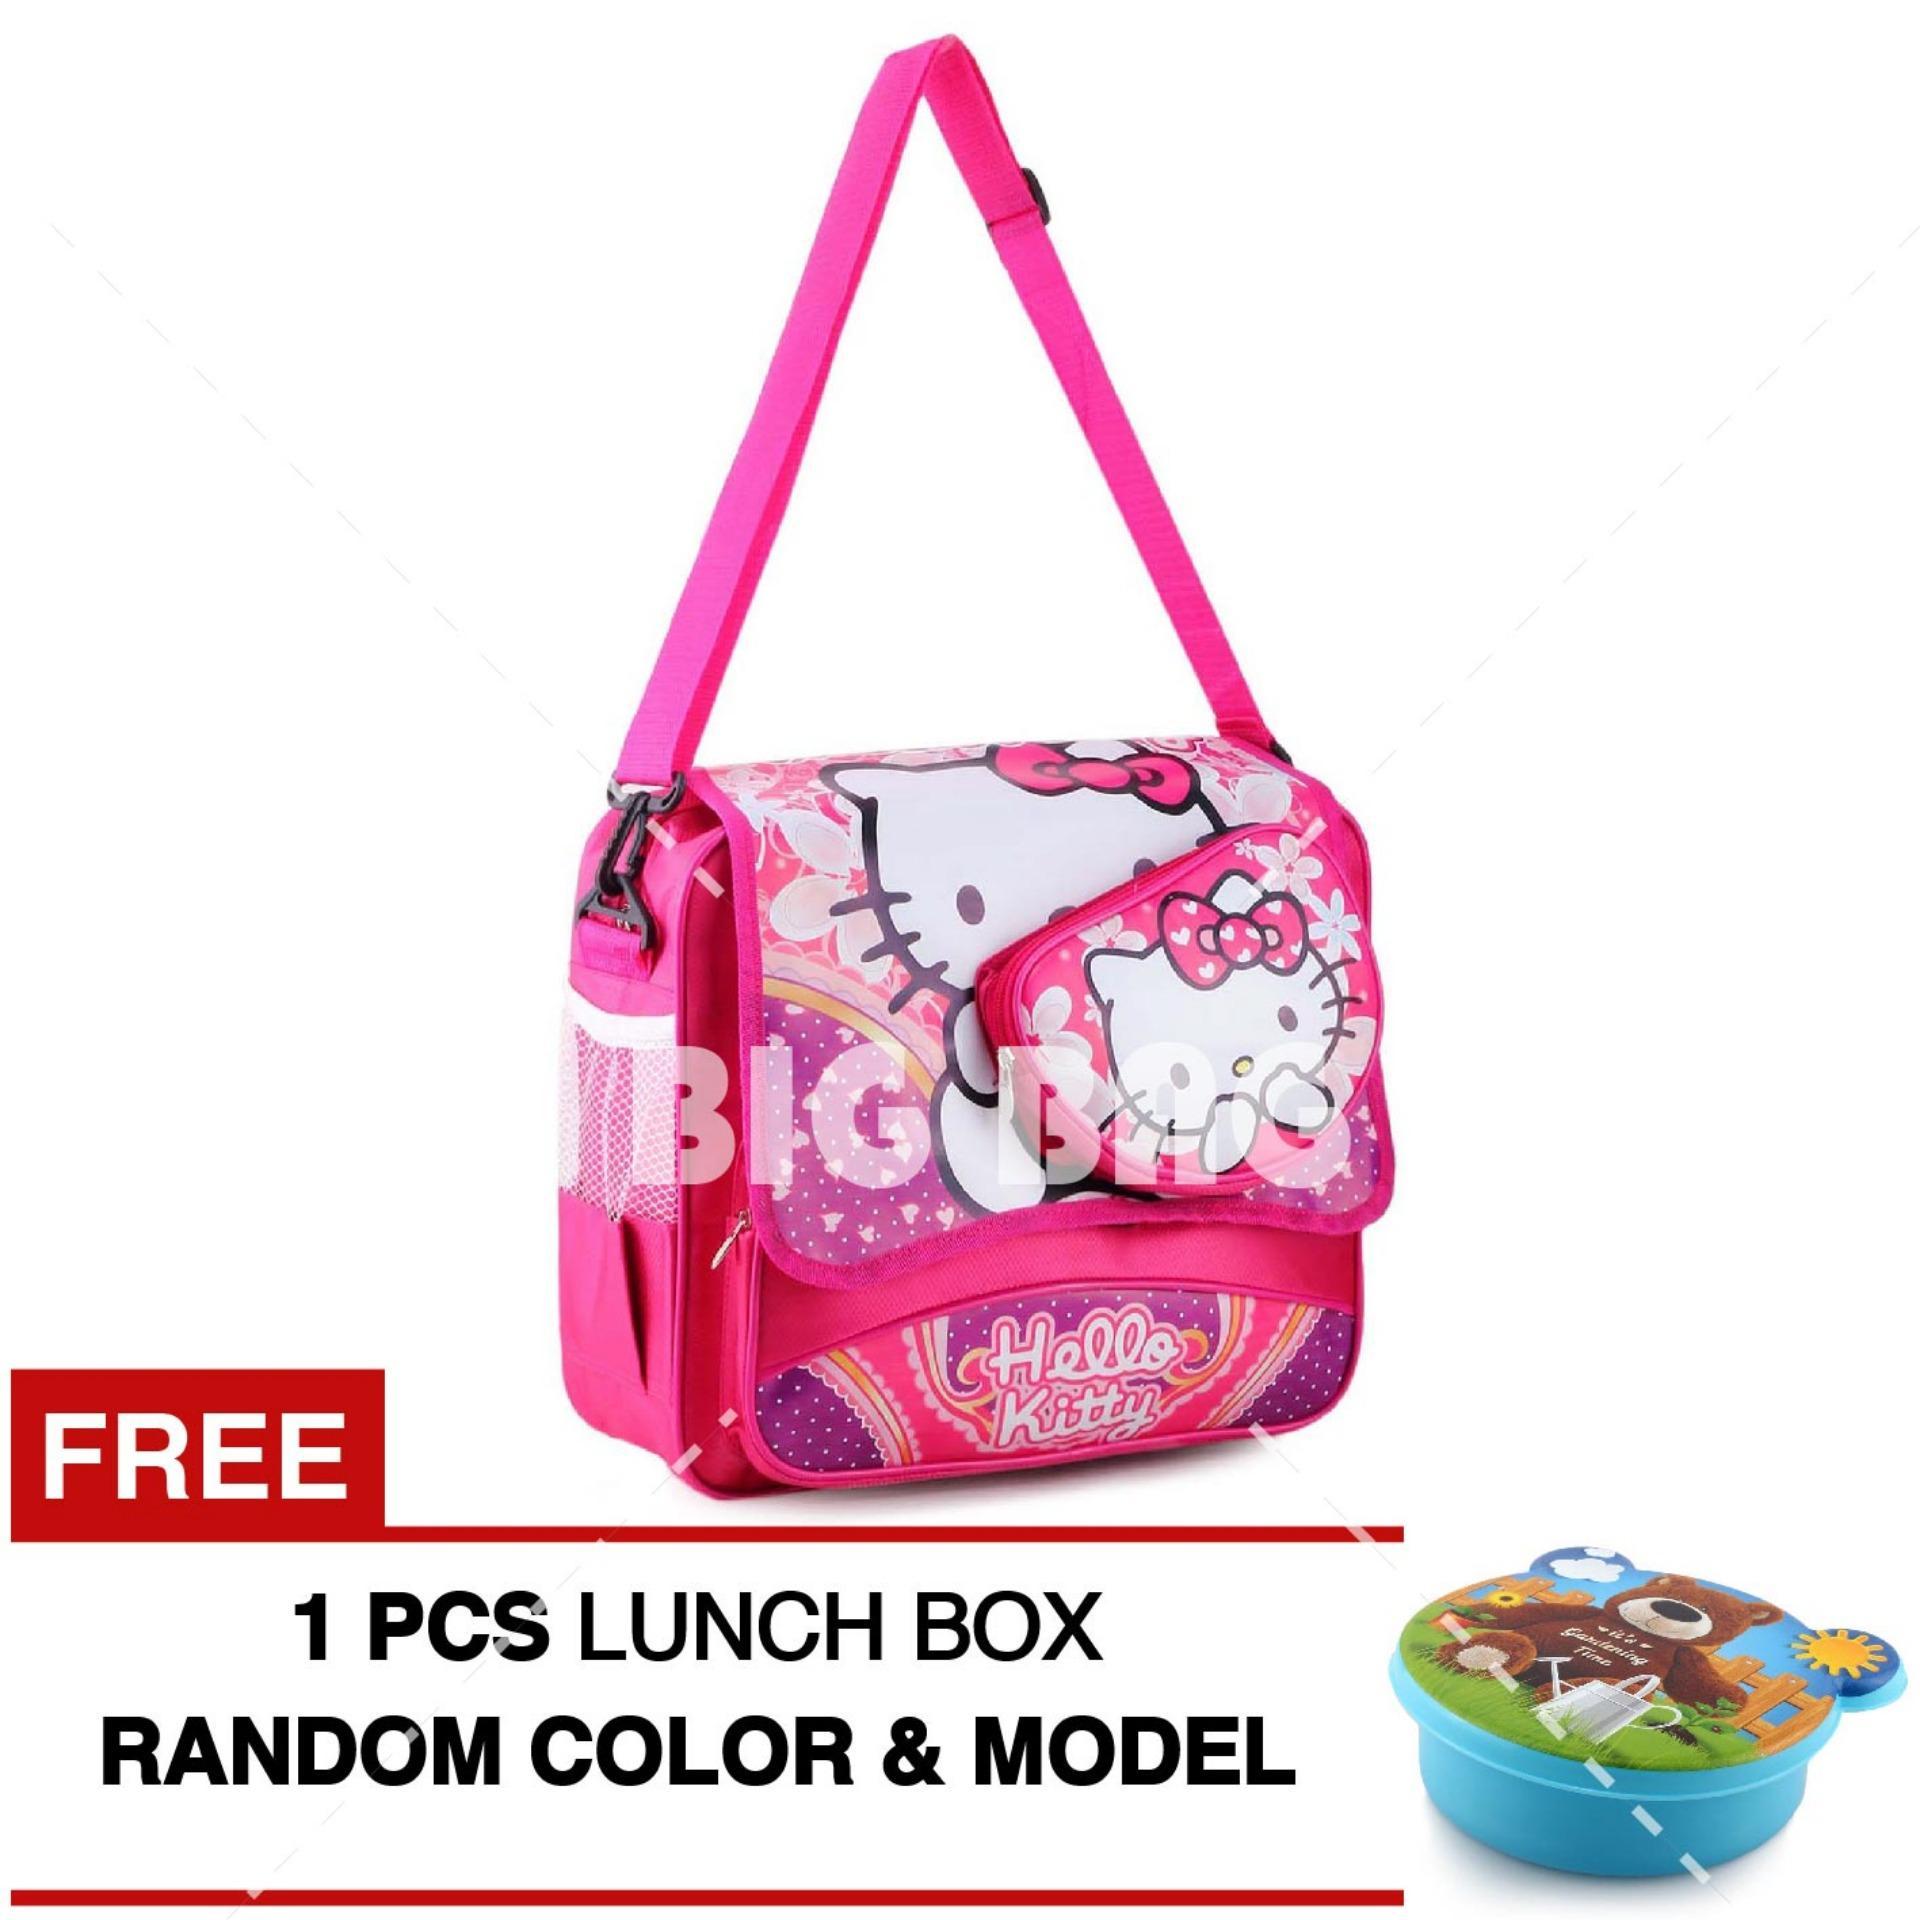 Tas Ransel dan Selempang Dwifungsi Anak TK dan SD Hello Kitty - Hello Kitty  - Flowers - School Bag Tas Sekolah Anak - PINK + FREE Lunchbox Tas Anak  Sekolah ... 1642712b46